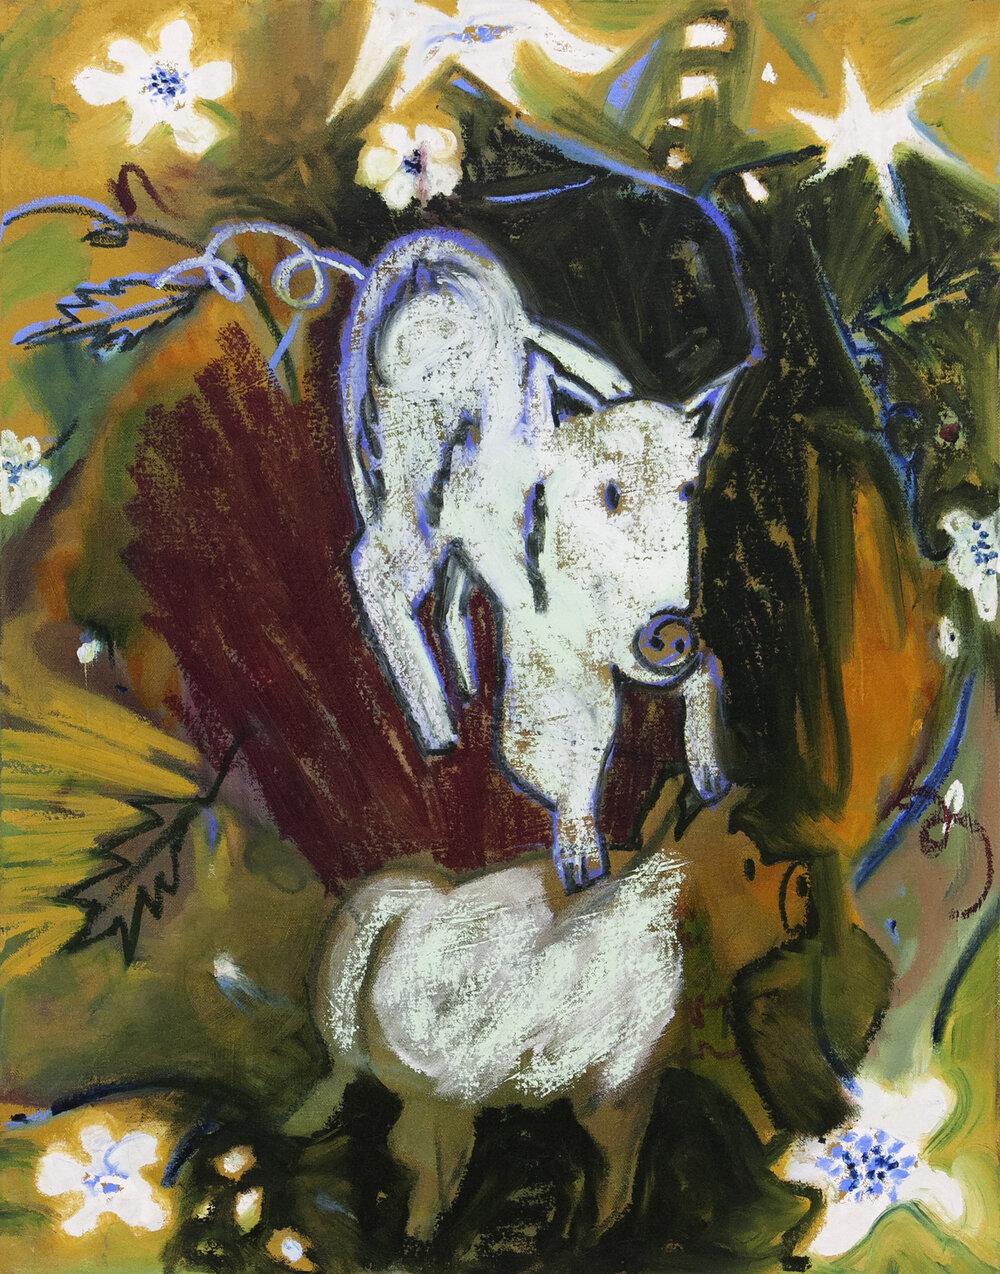 "Piggies, oil on canvas, 28"" x 22"", 2019"